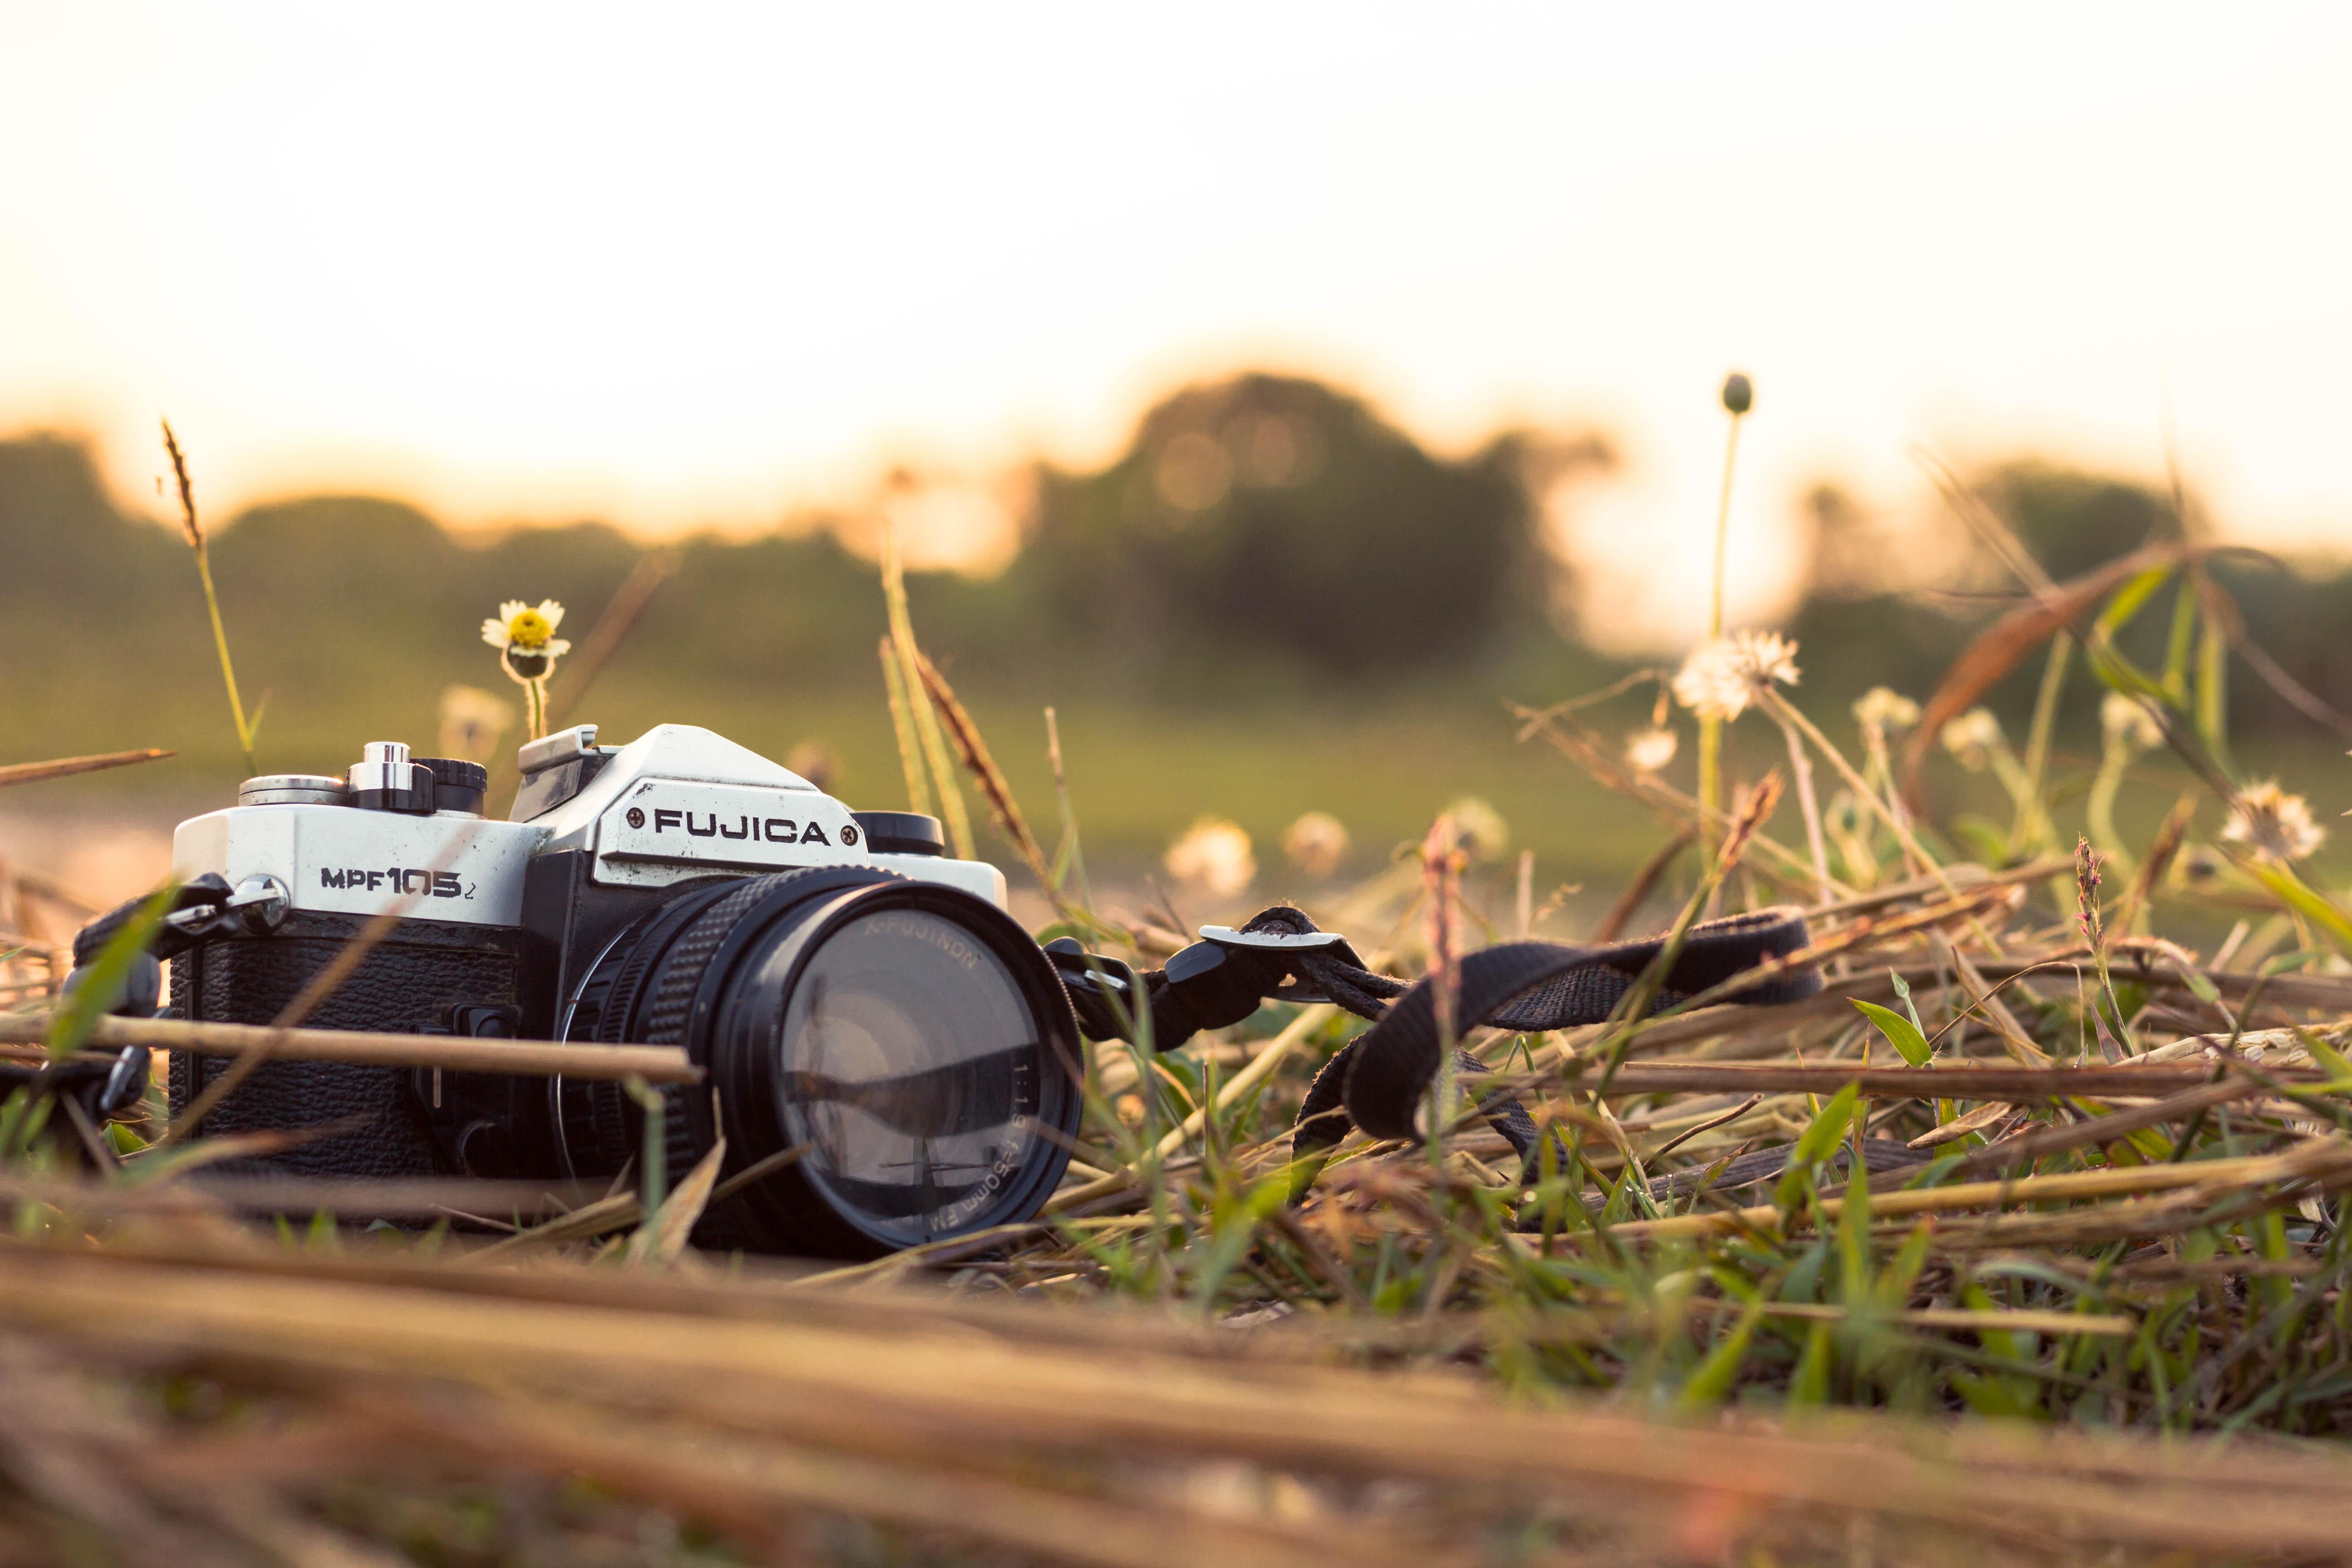 Gambar Latar Belakang Kabur Lensa Kamera Warna Siang